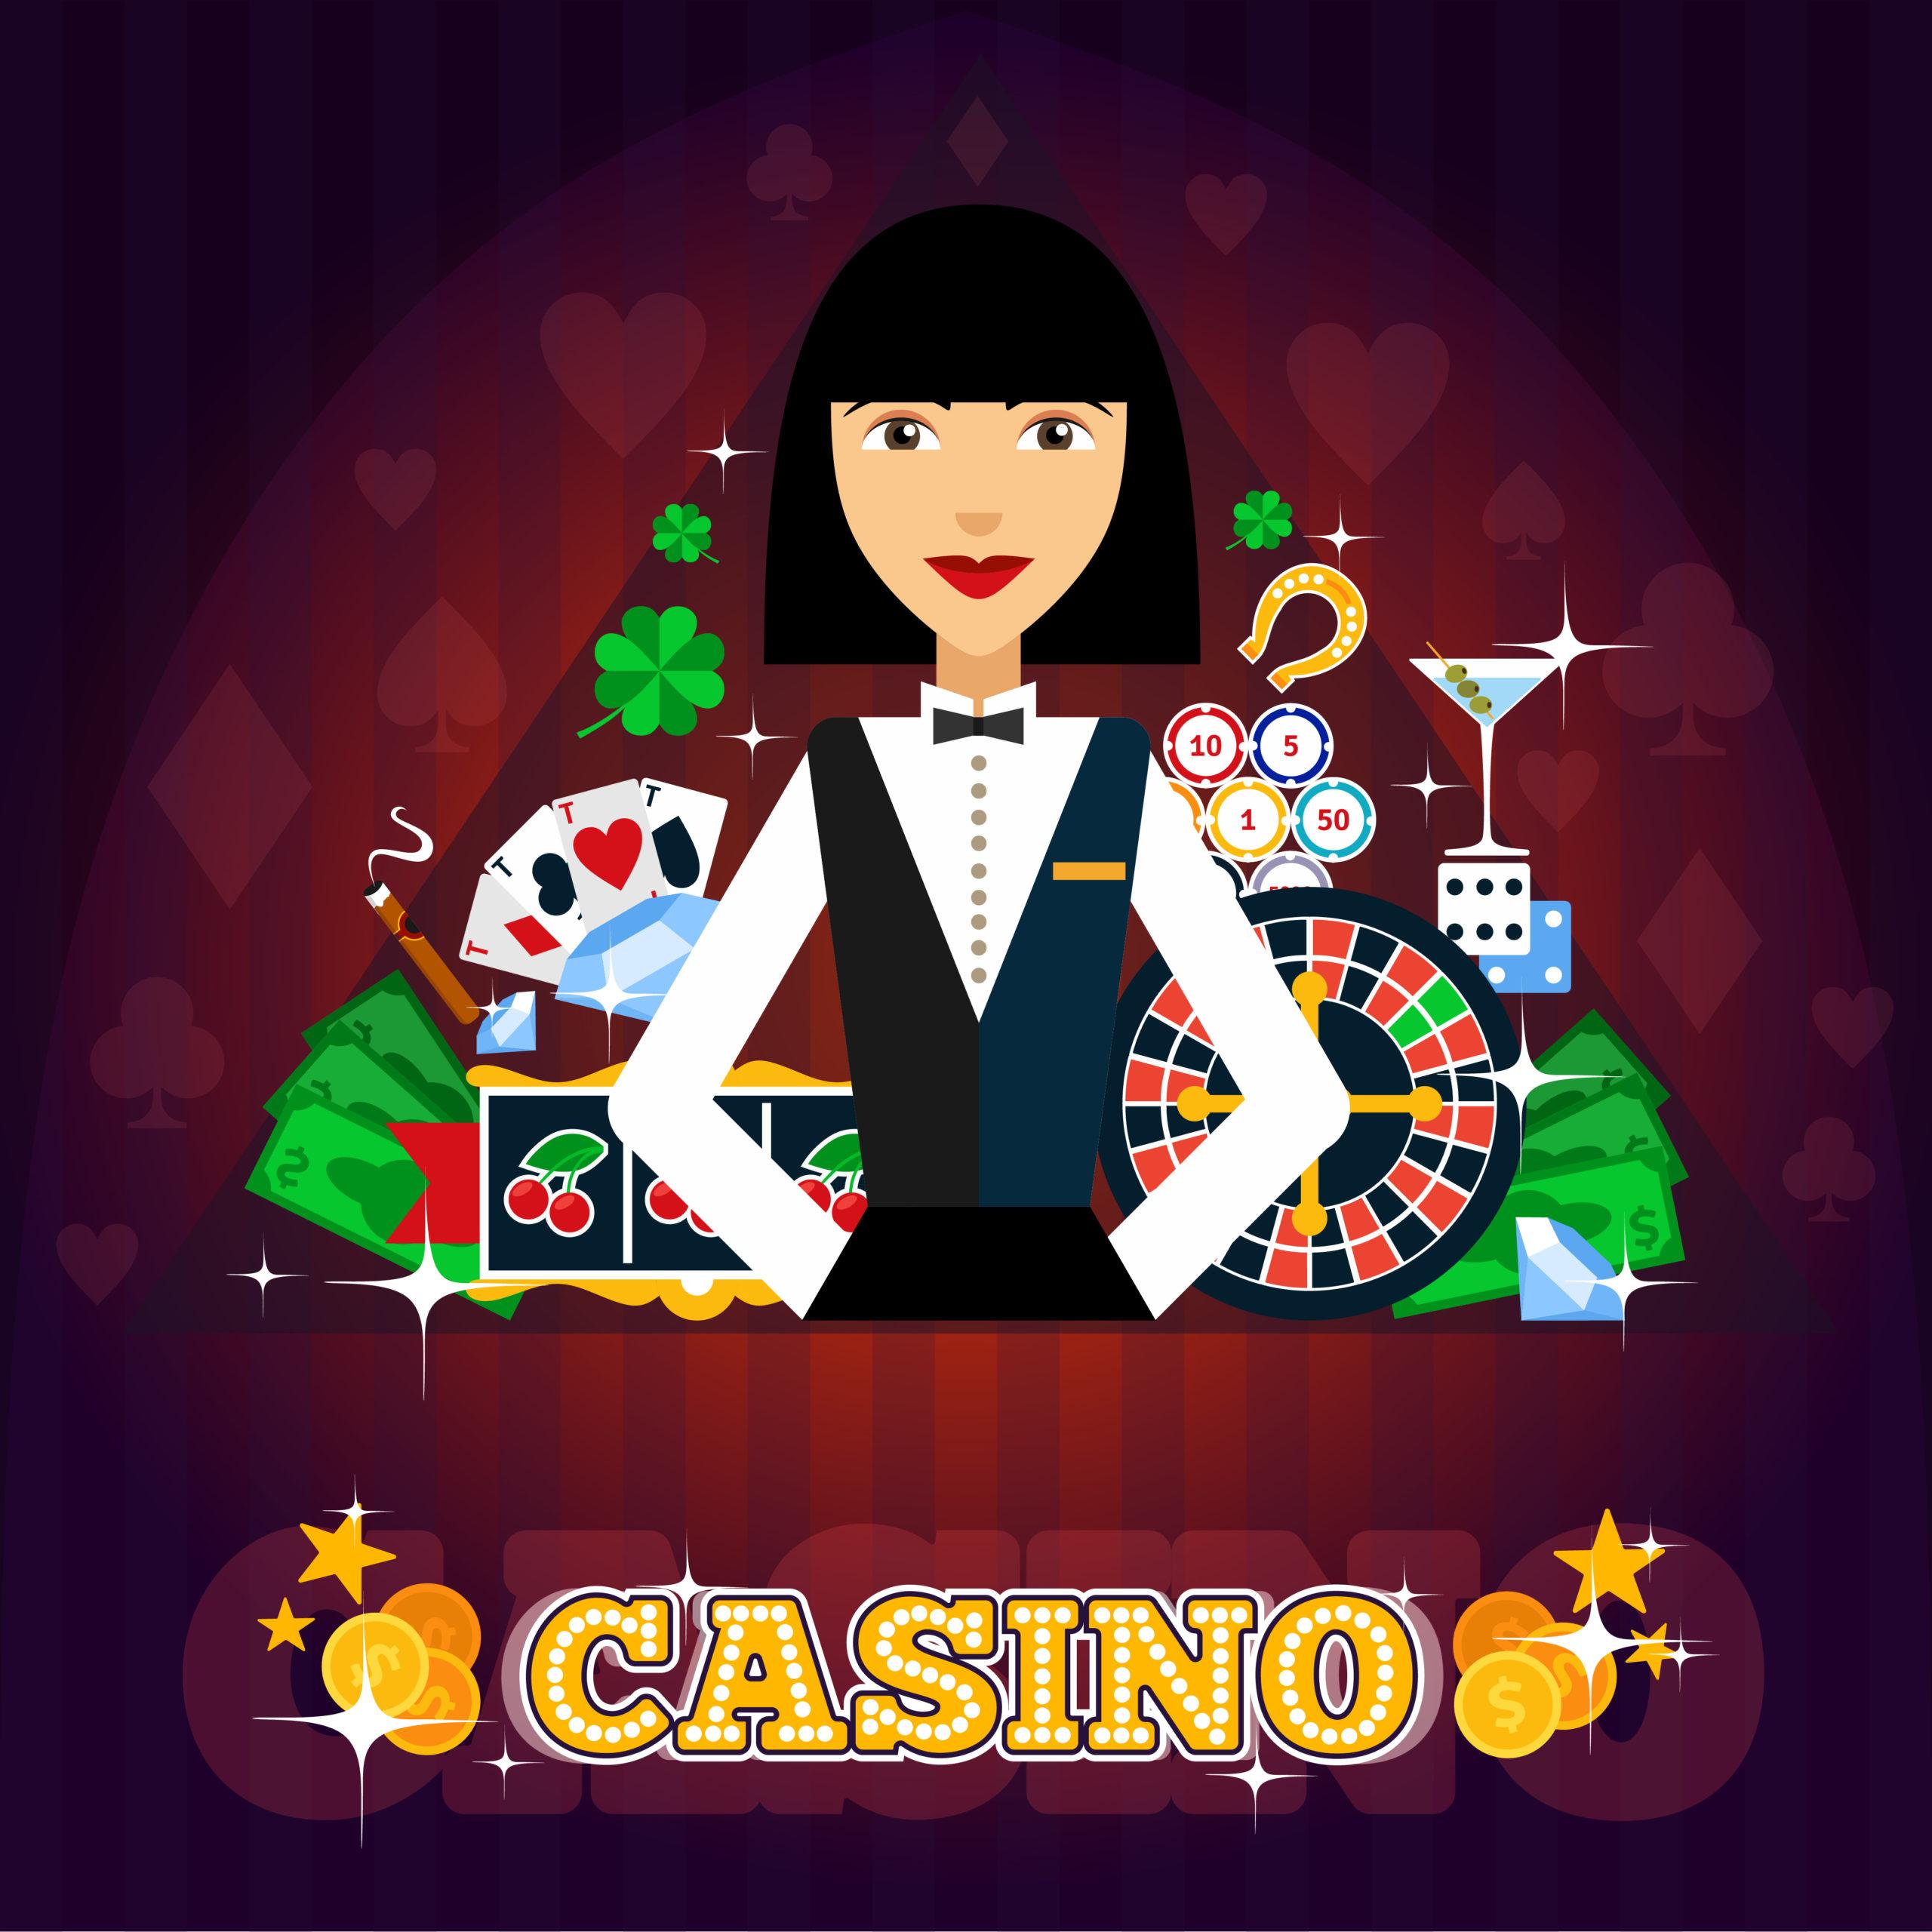 casino online con live dealer